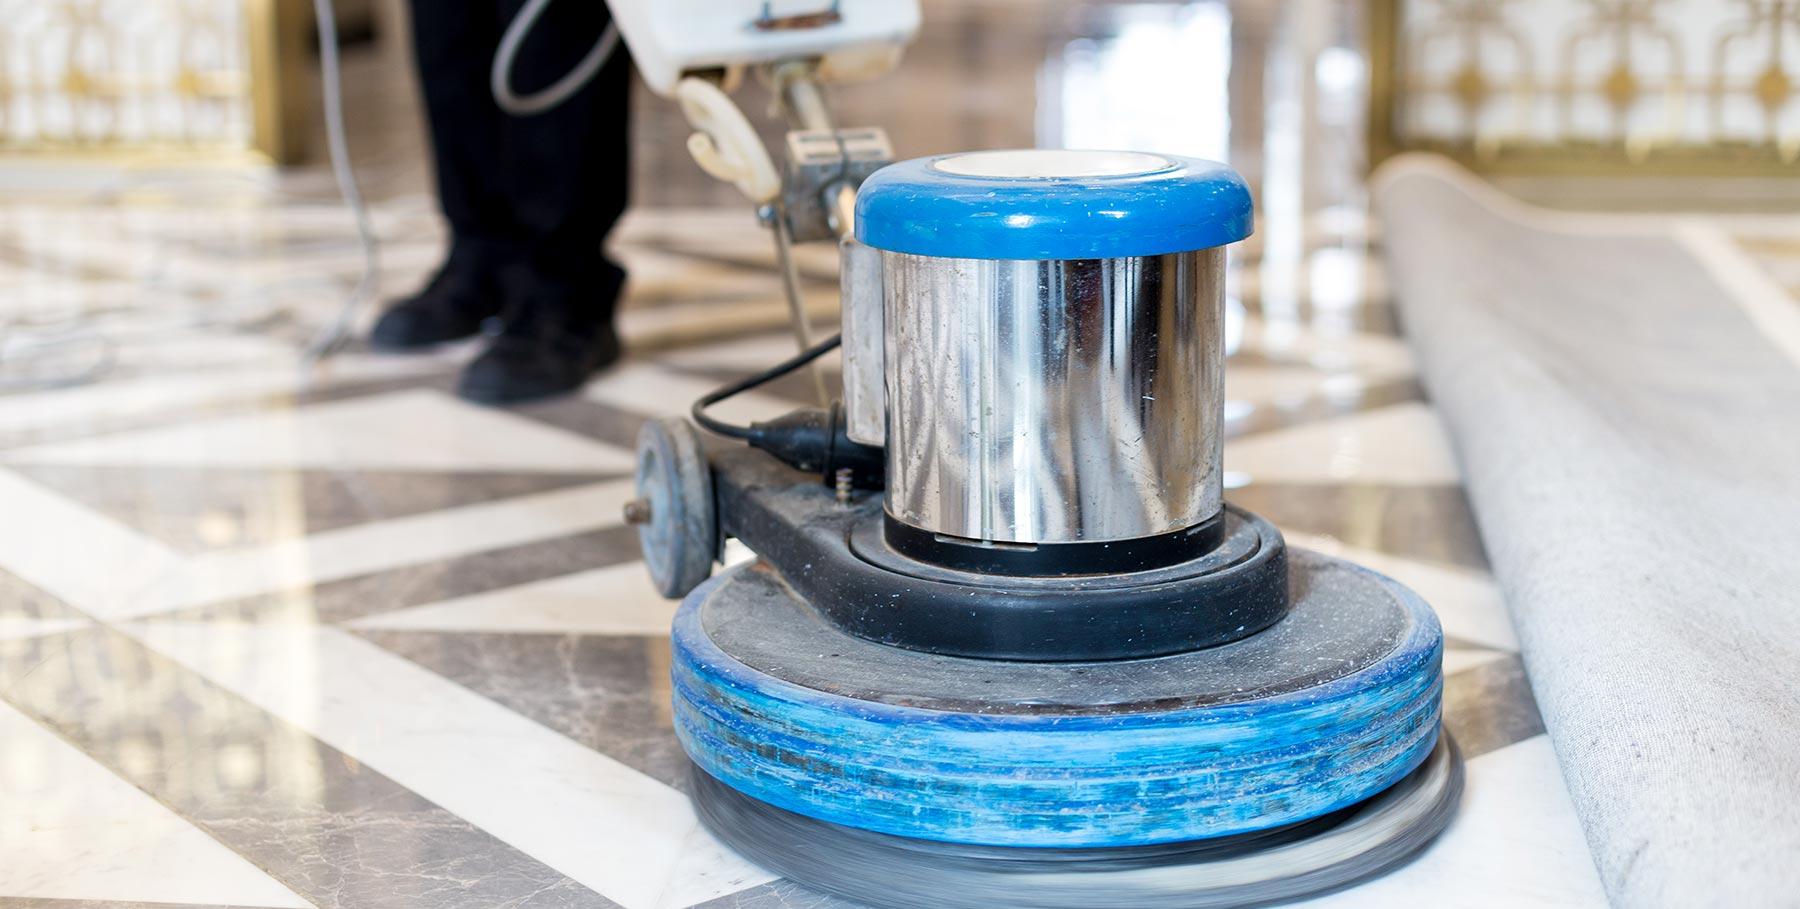 vloeren boenen machine